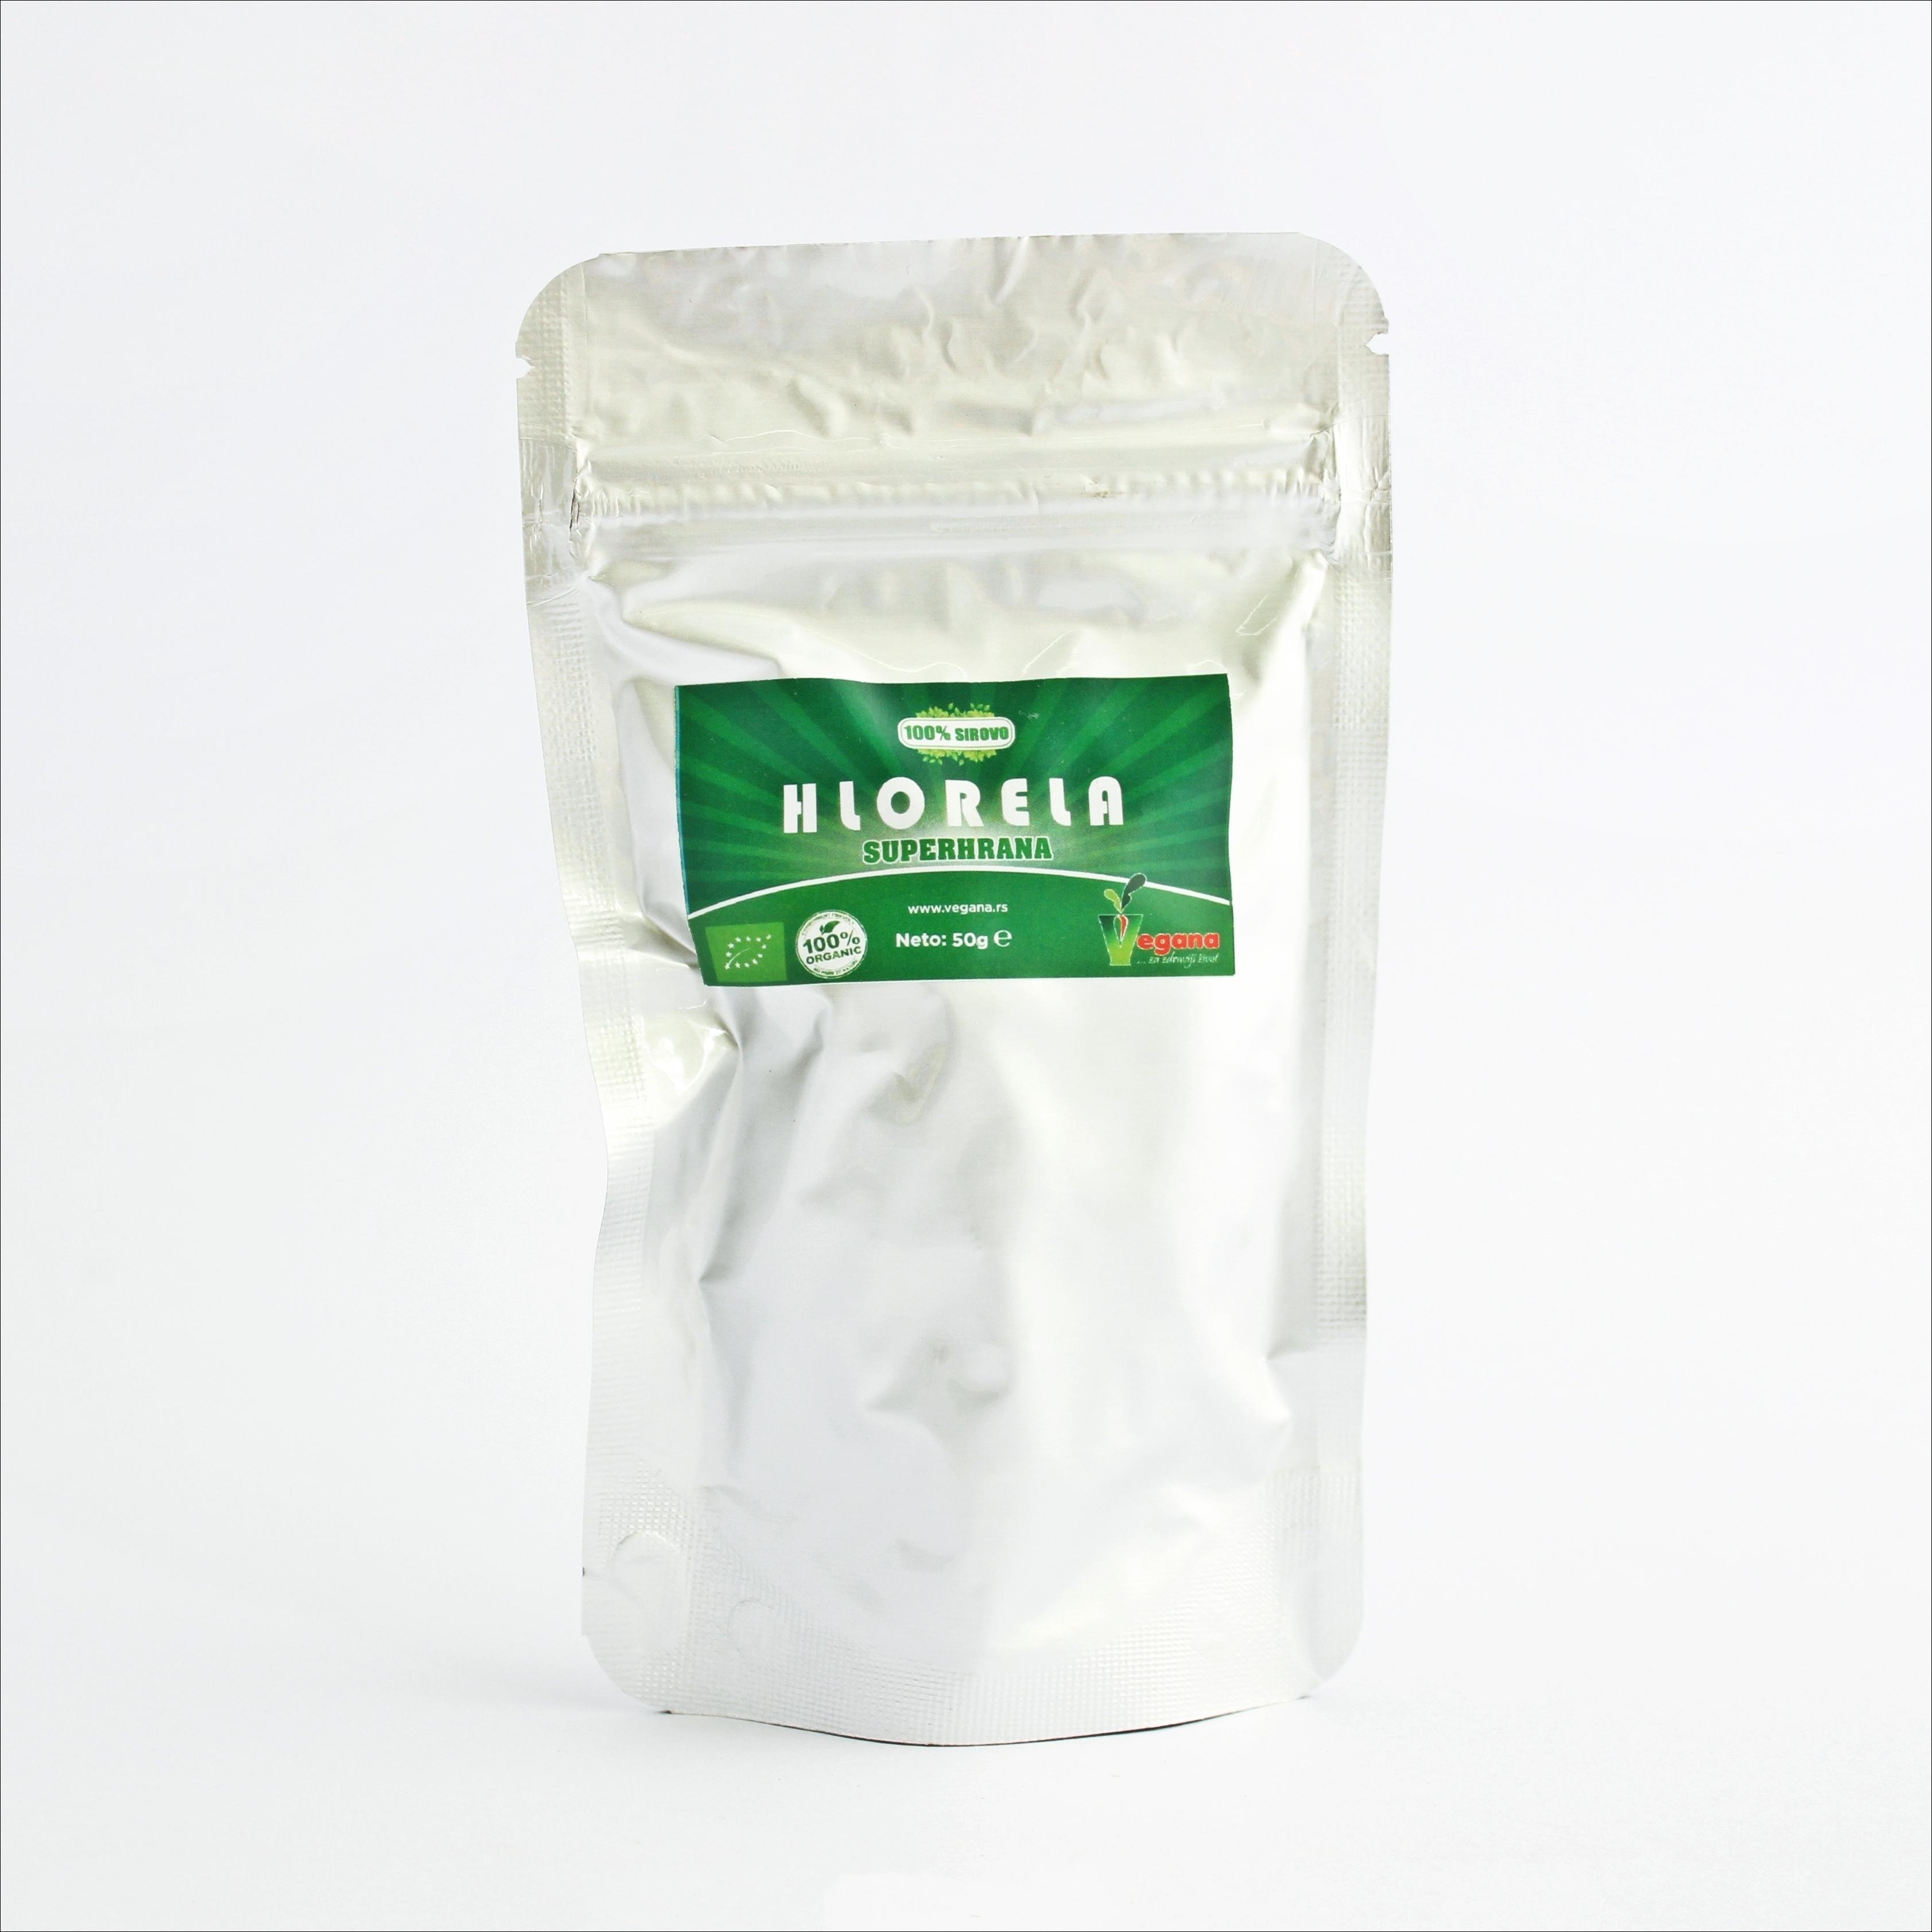 Vegana Hlorela tablete 100 g 00255